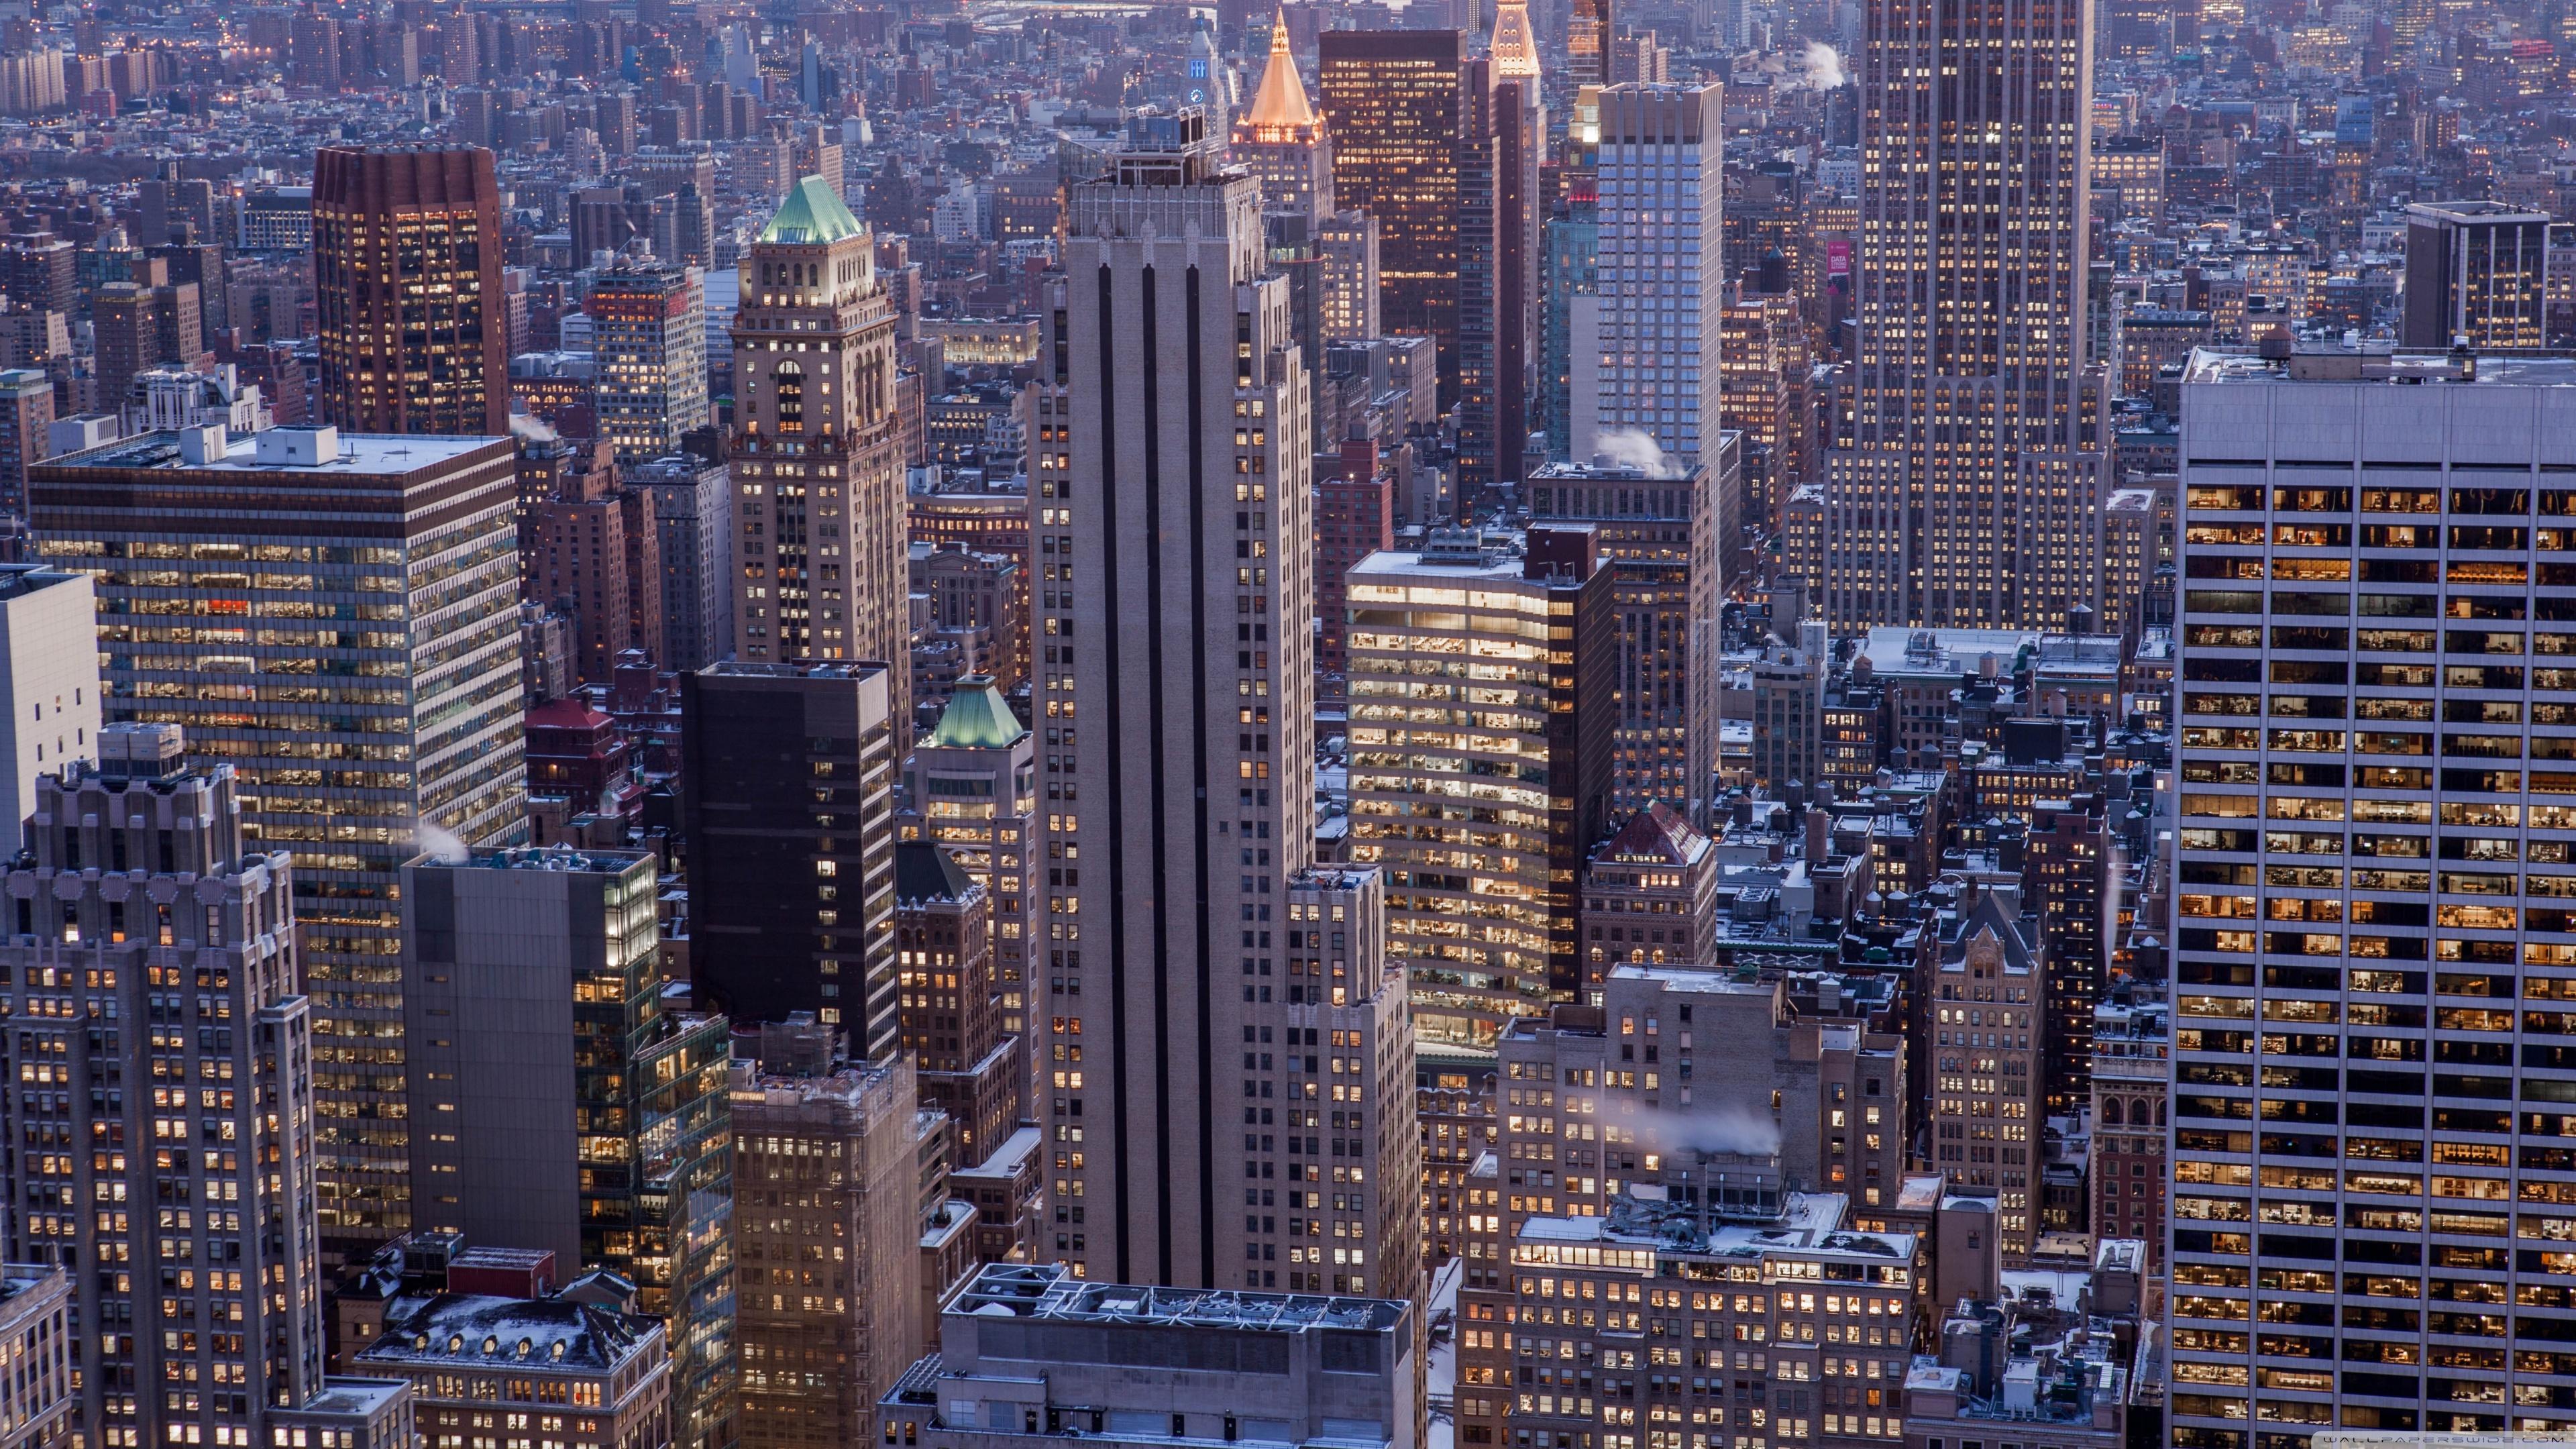 Uhd 16 - - New York City , HD Wallpaper & Backgrounds